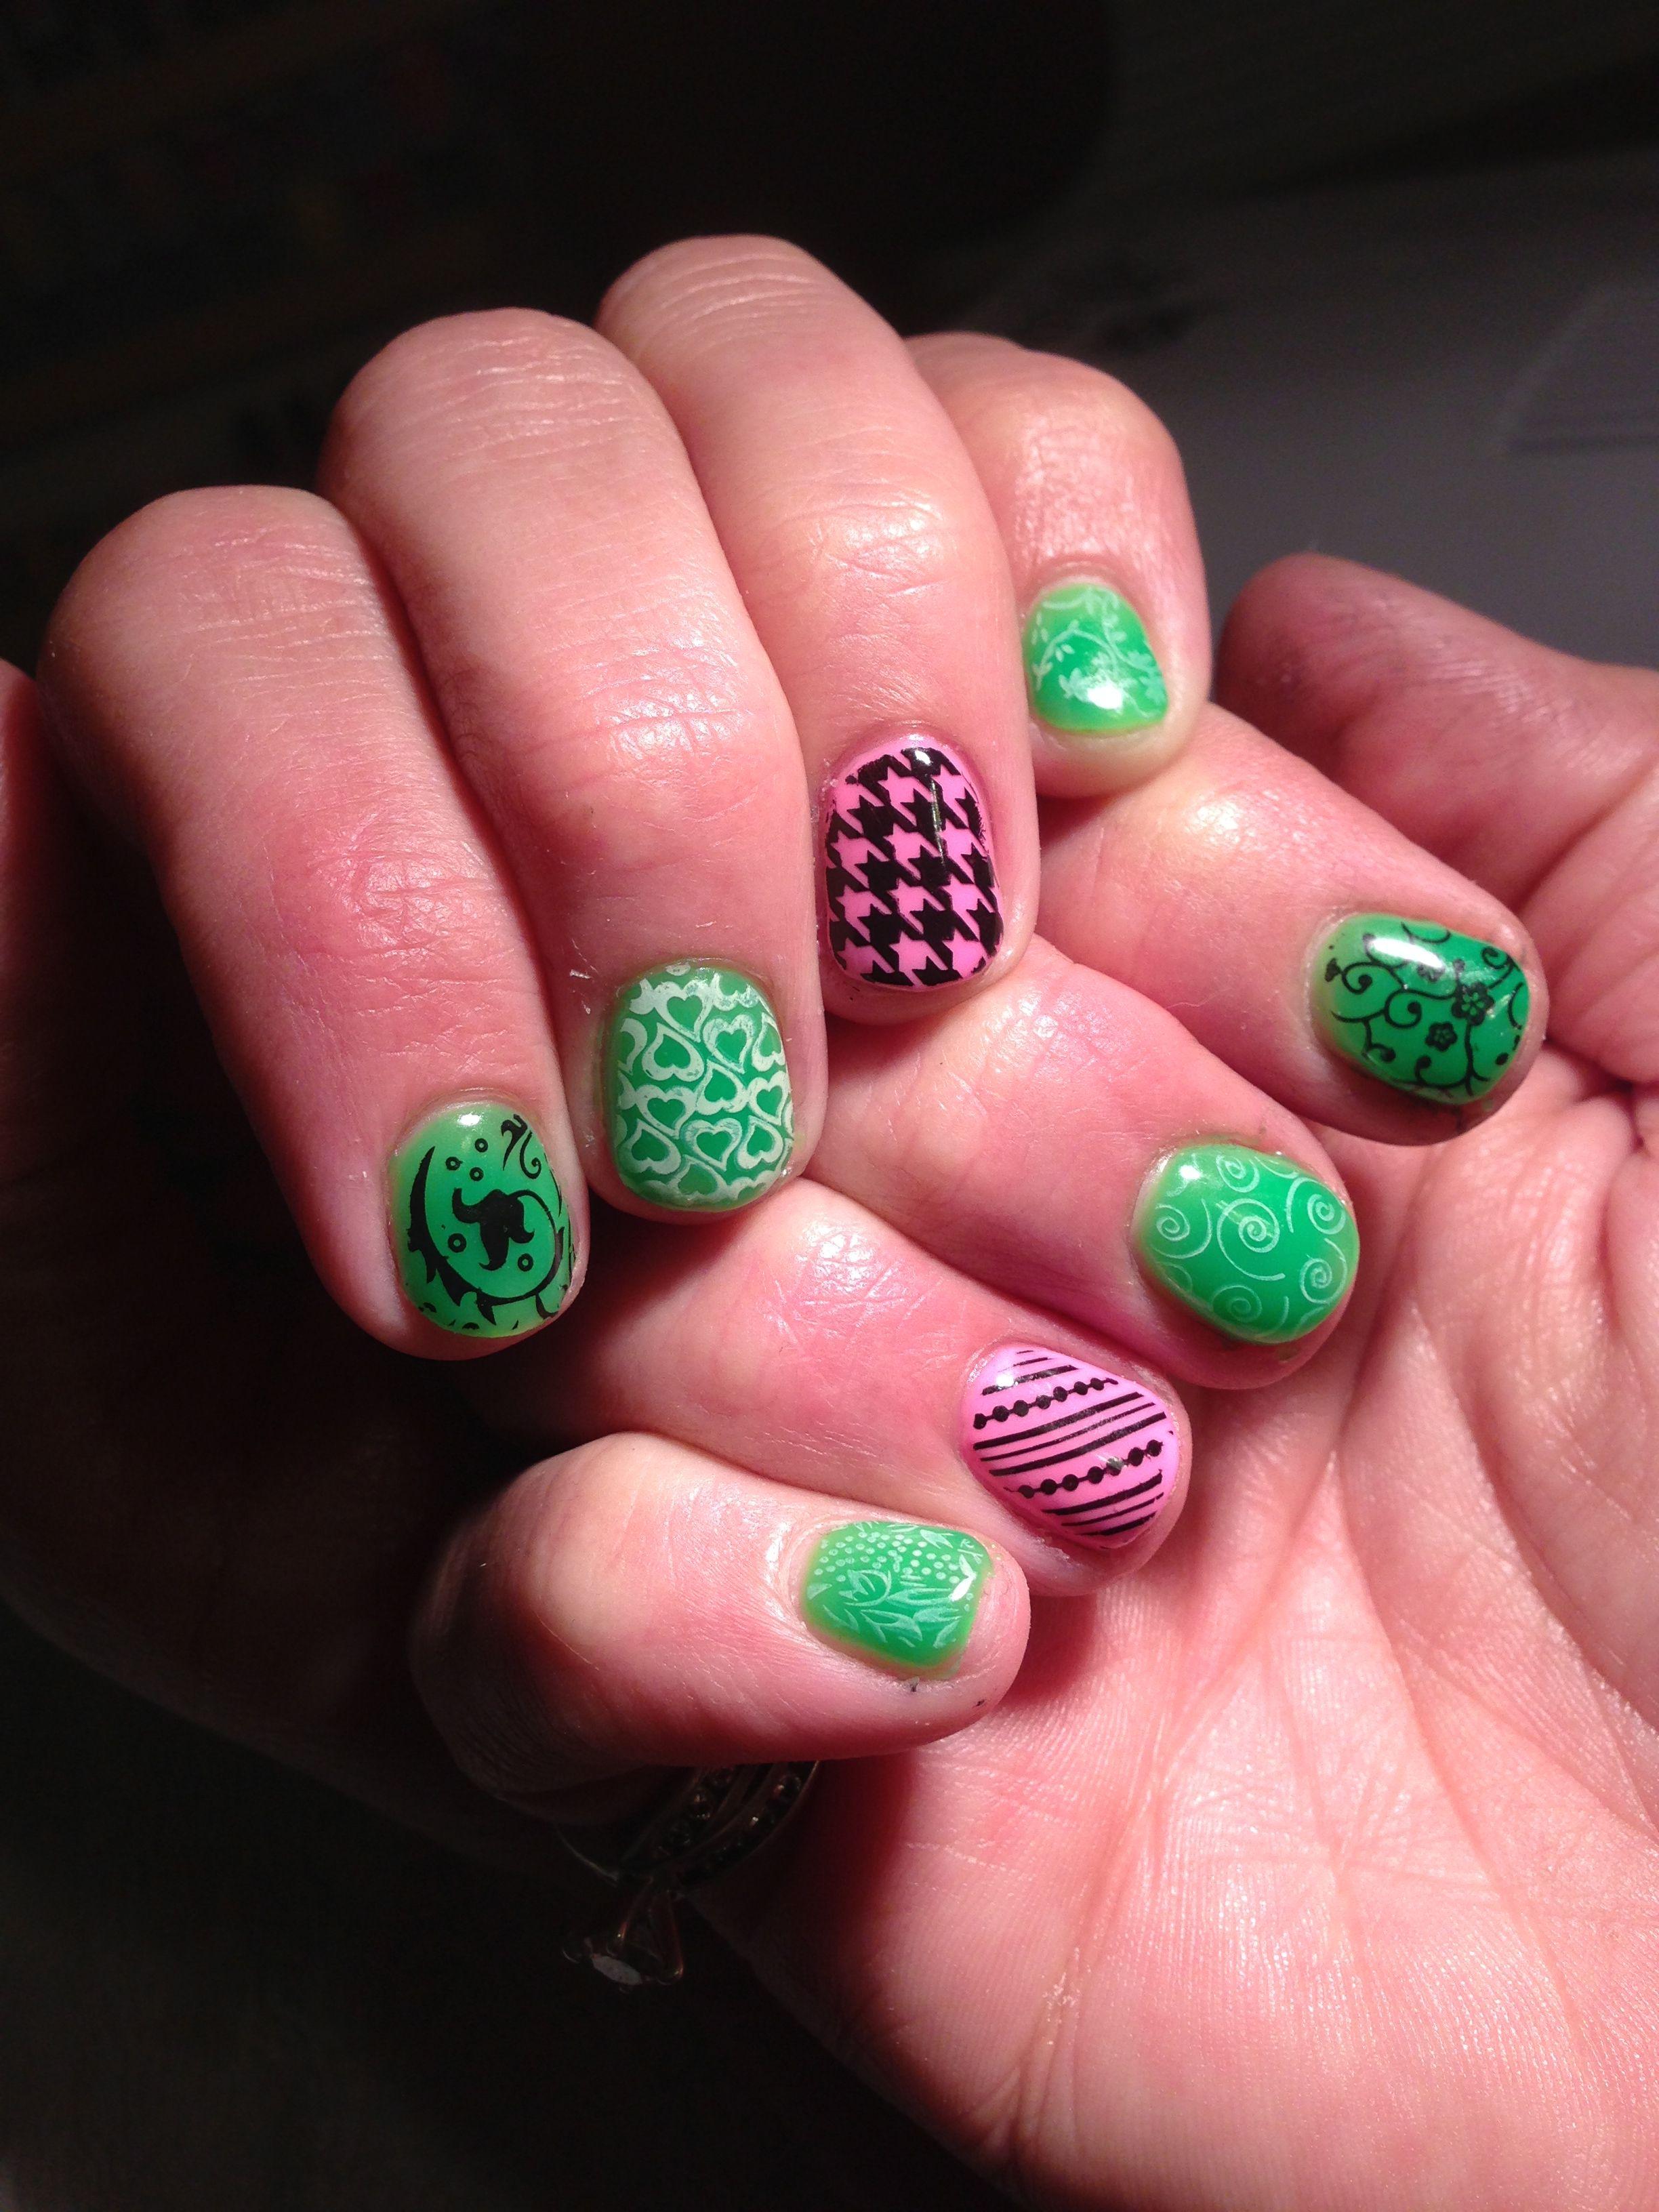 Gelish, stamp, glow in the dark Gel nails, My nails